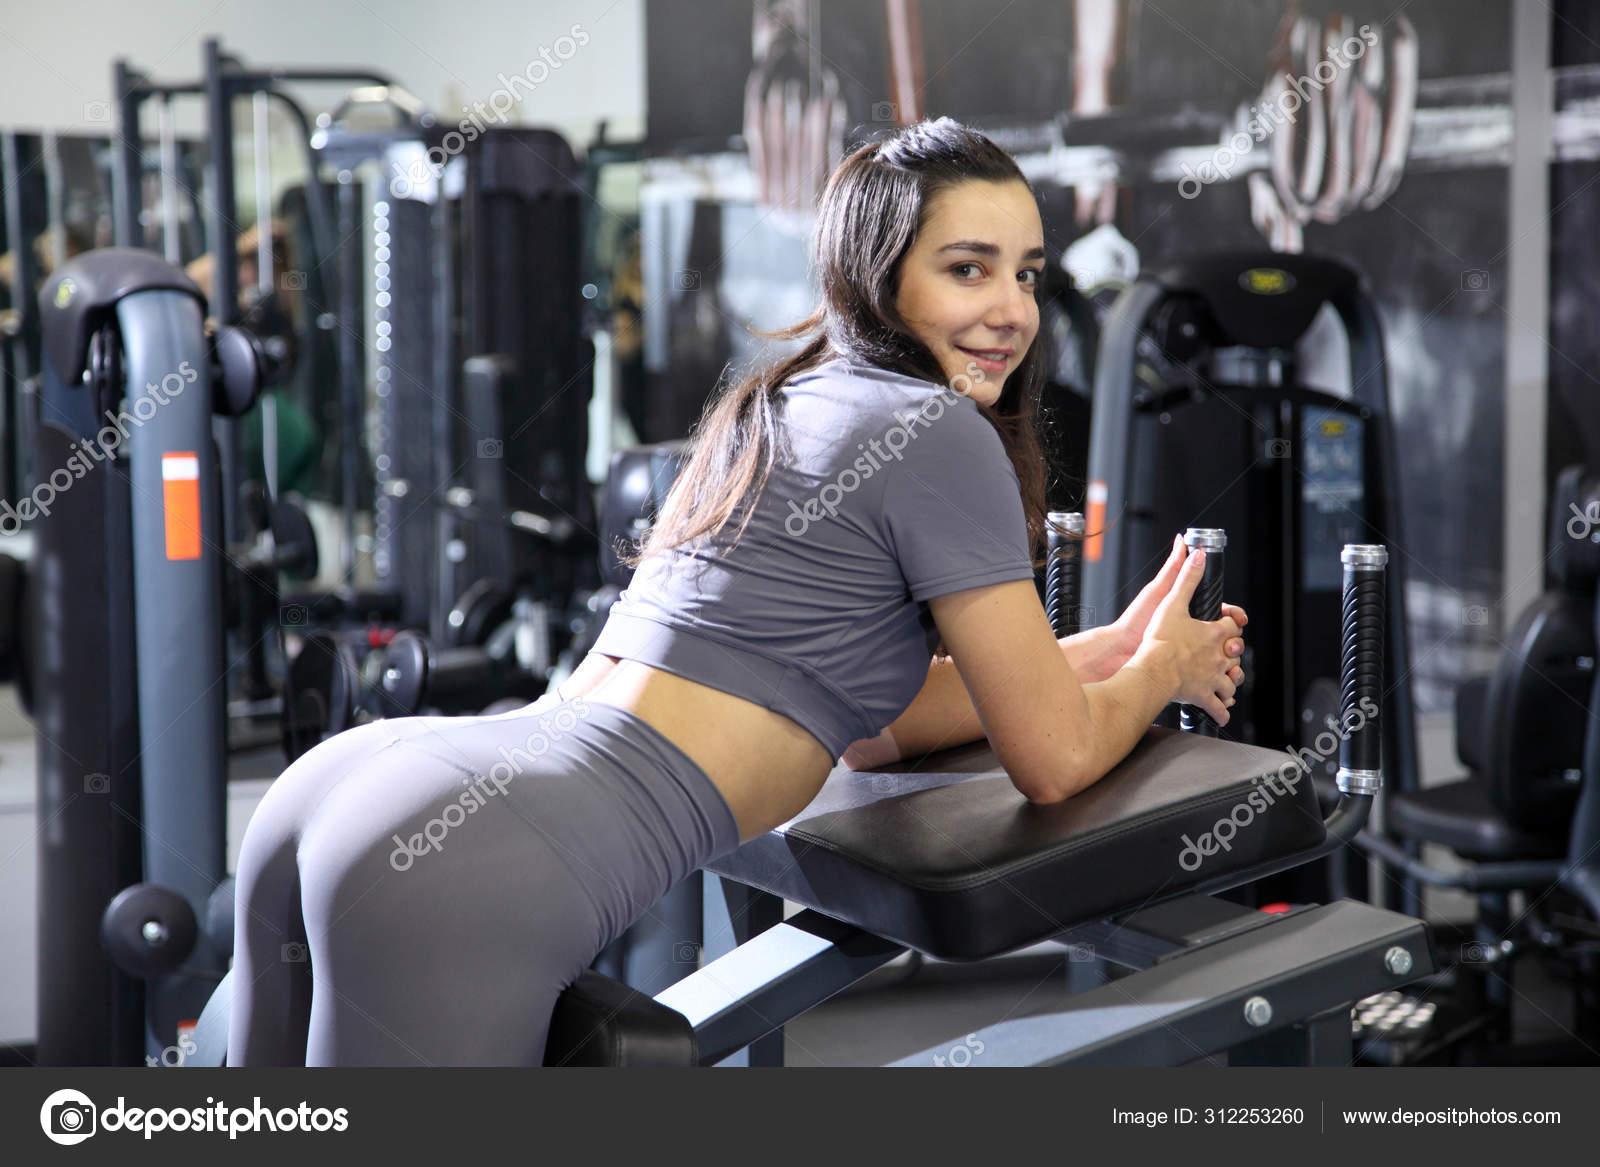 Young Girls Doing Fitness Exercises Gym Training Gym Body Shaping — Stock  Photo © MastrVideo #312253260